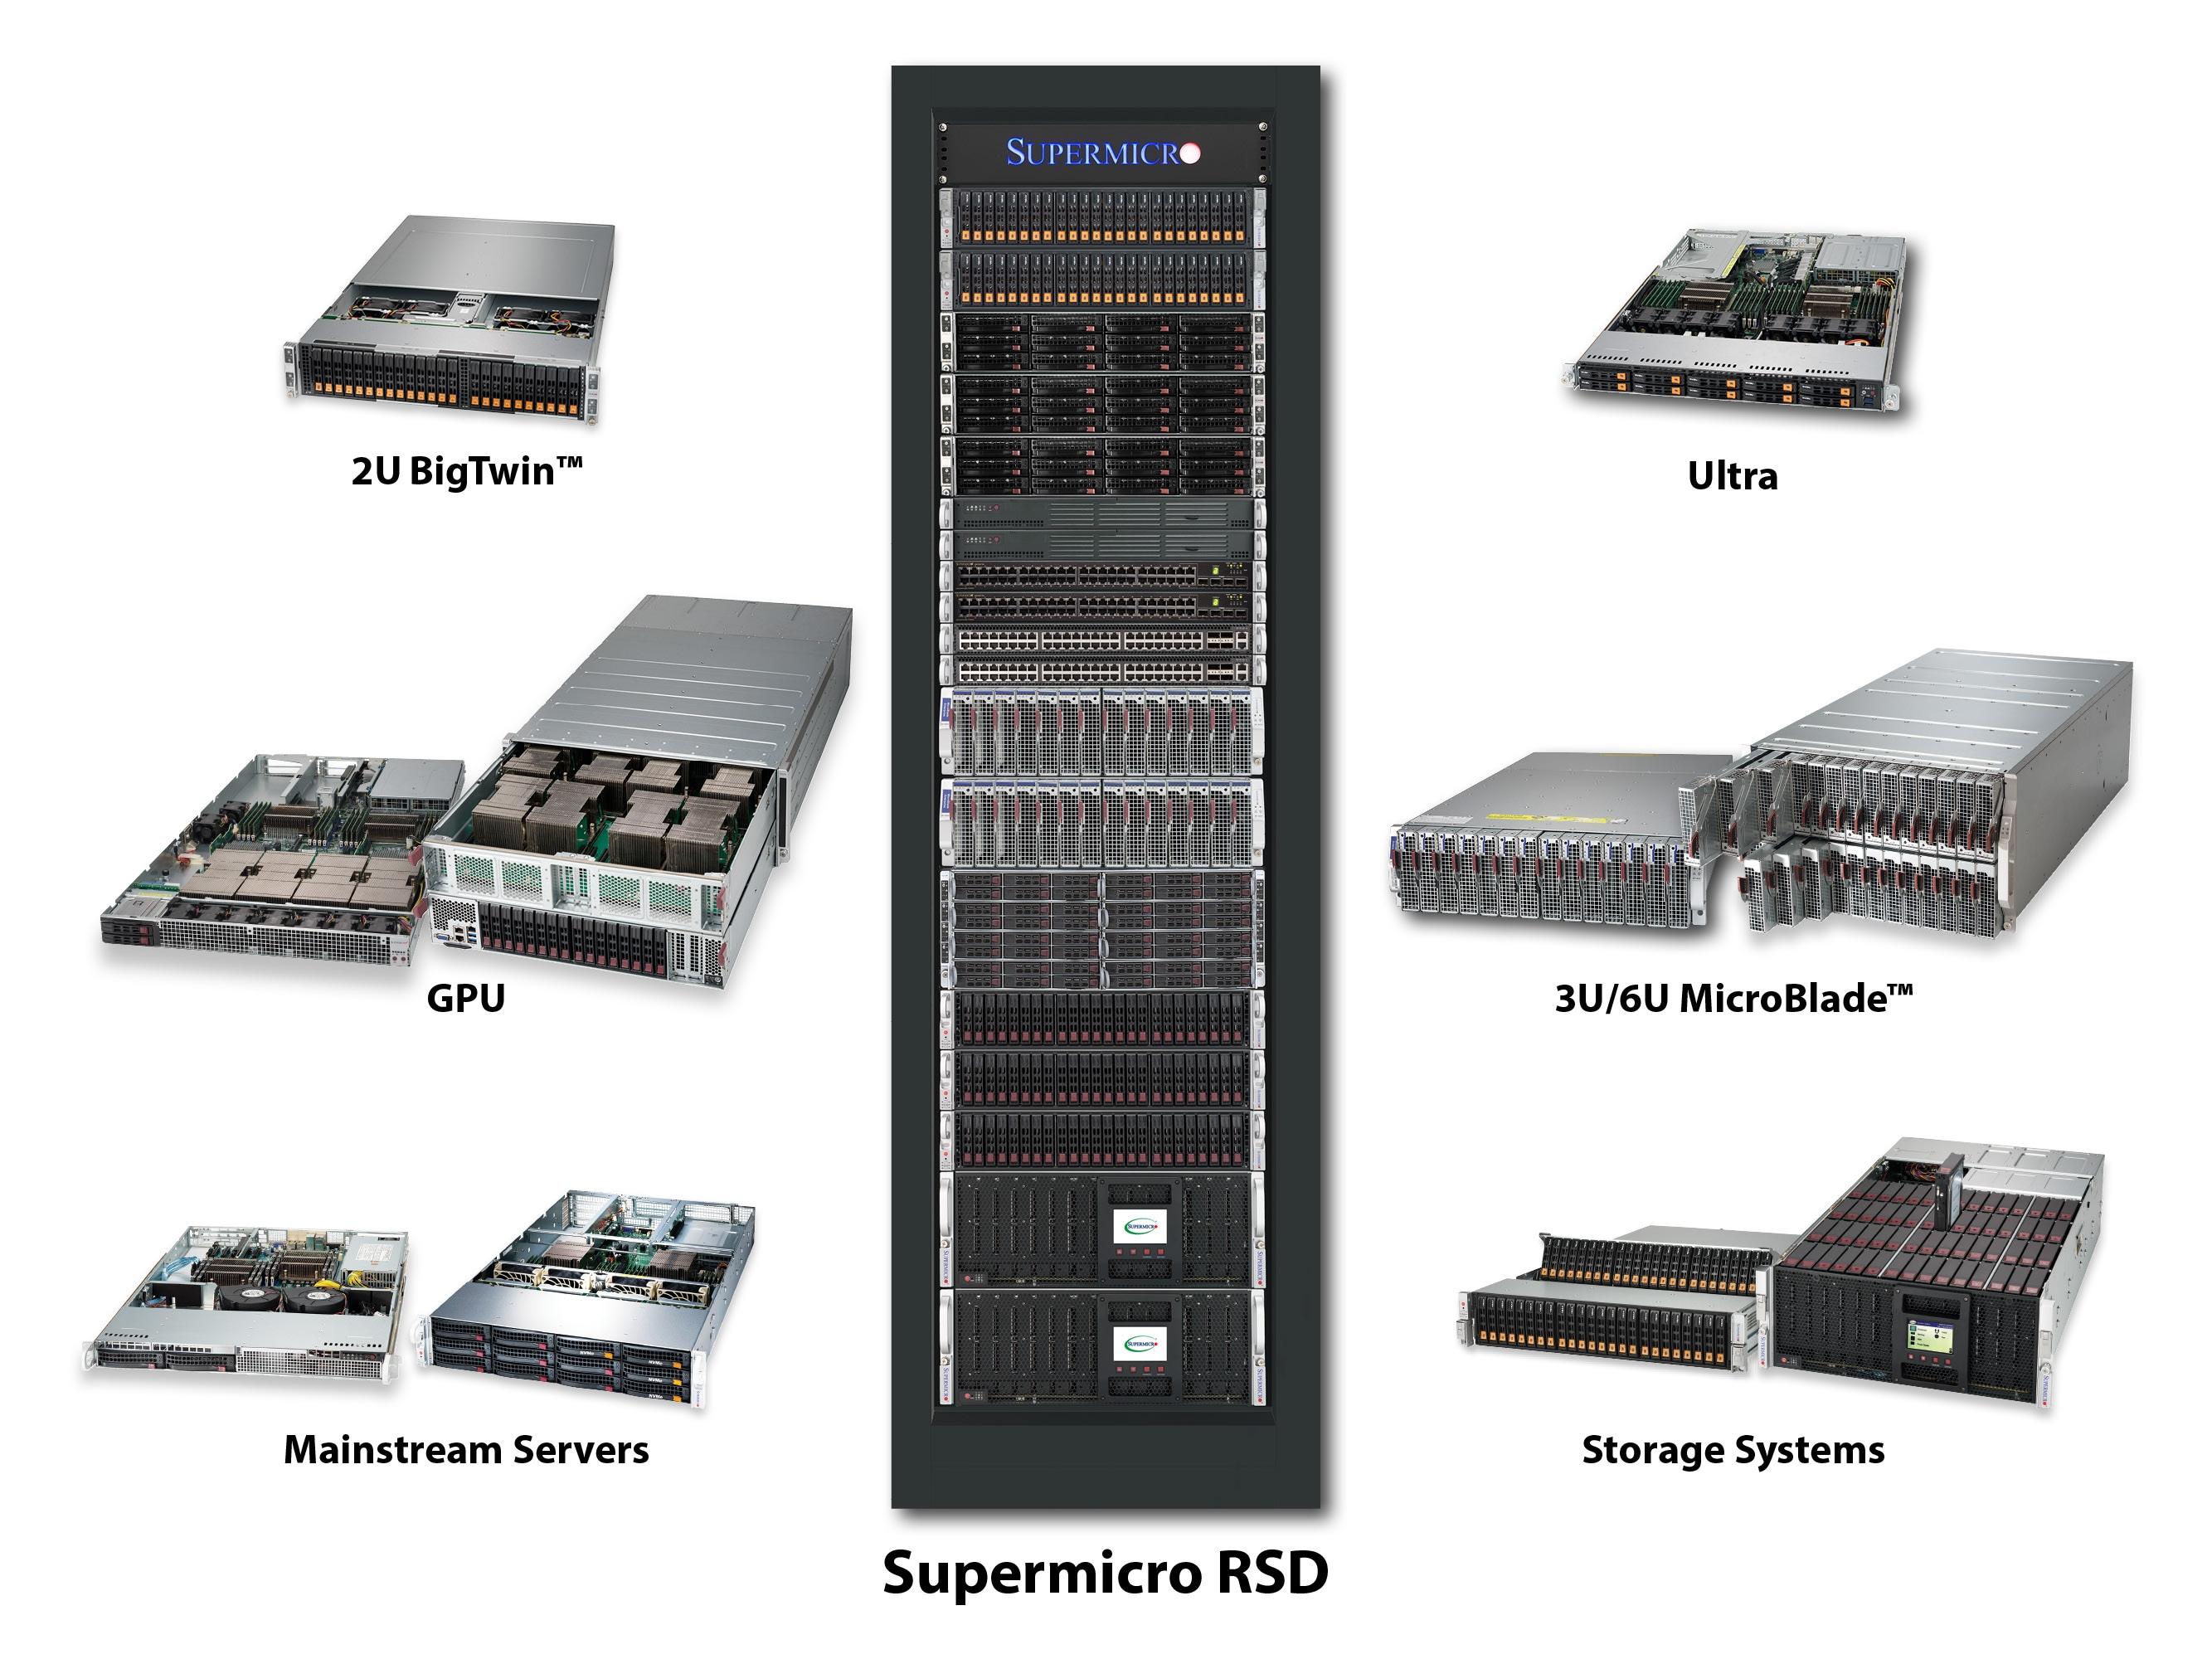 Supermicro | News | Supermicro Exhibits Latest IT Building